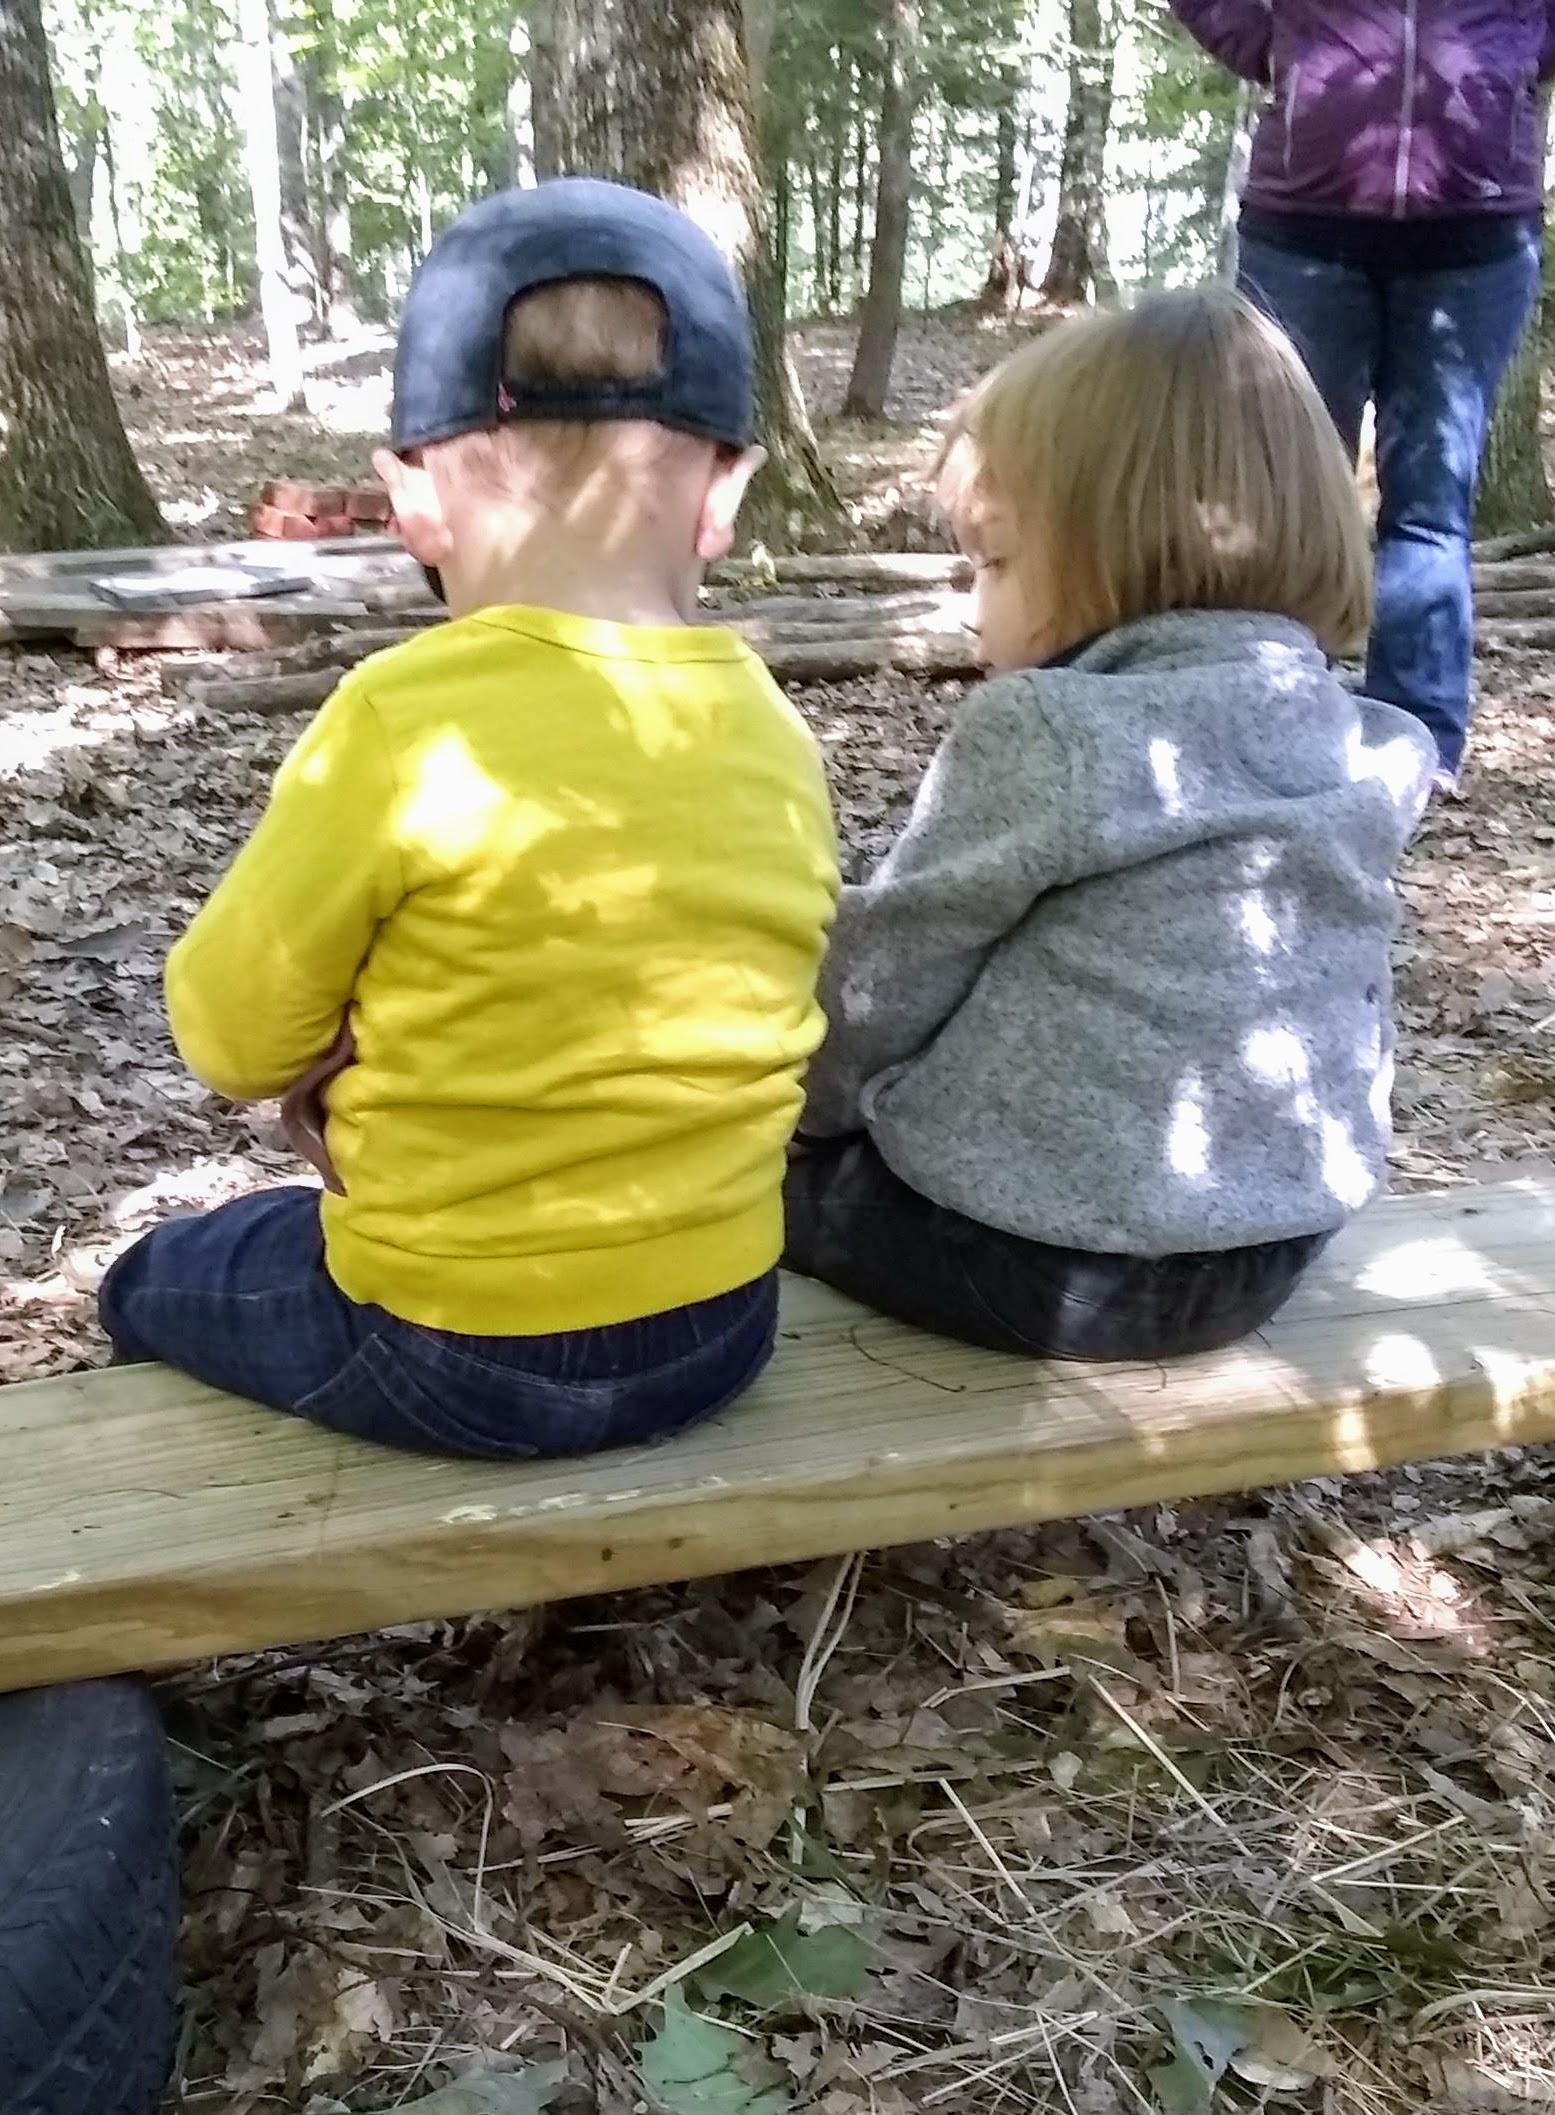 Tiny Ones Spring Saturdays - TimberNook of Greater Portland, Maine